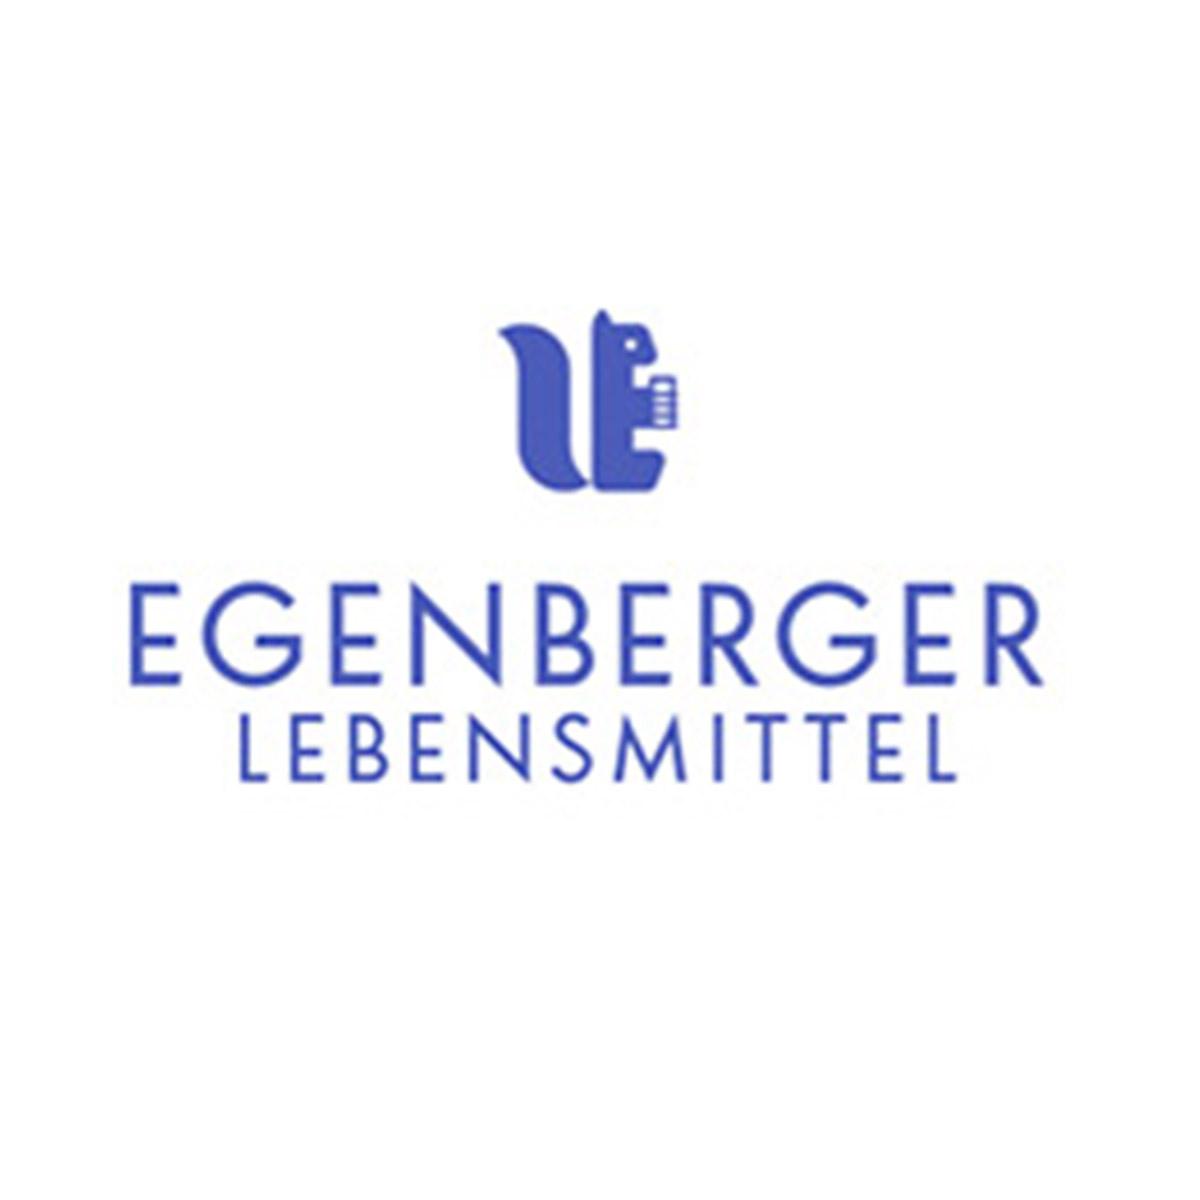 Egenberger Lebensmittel Logo